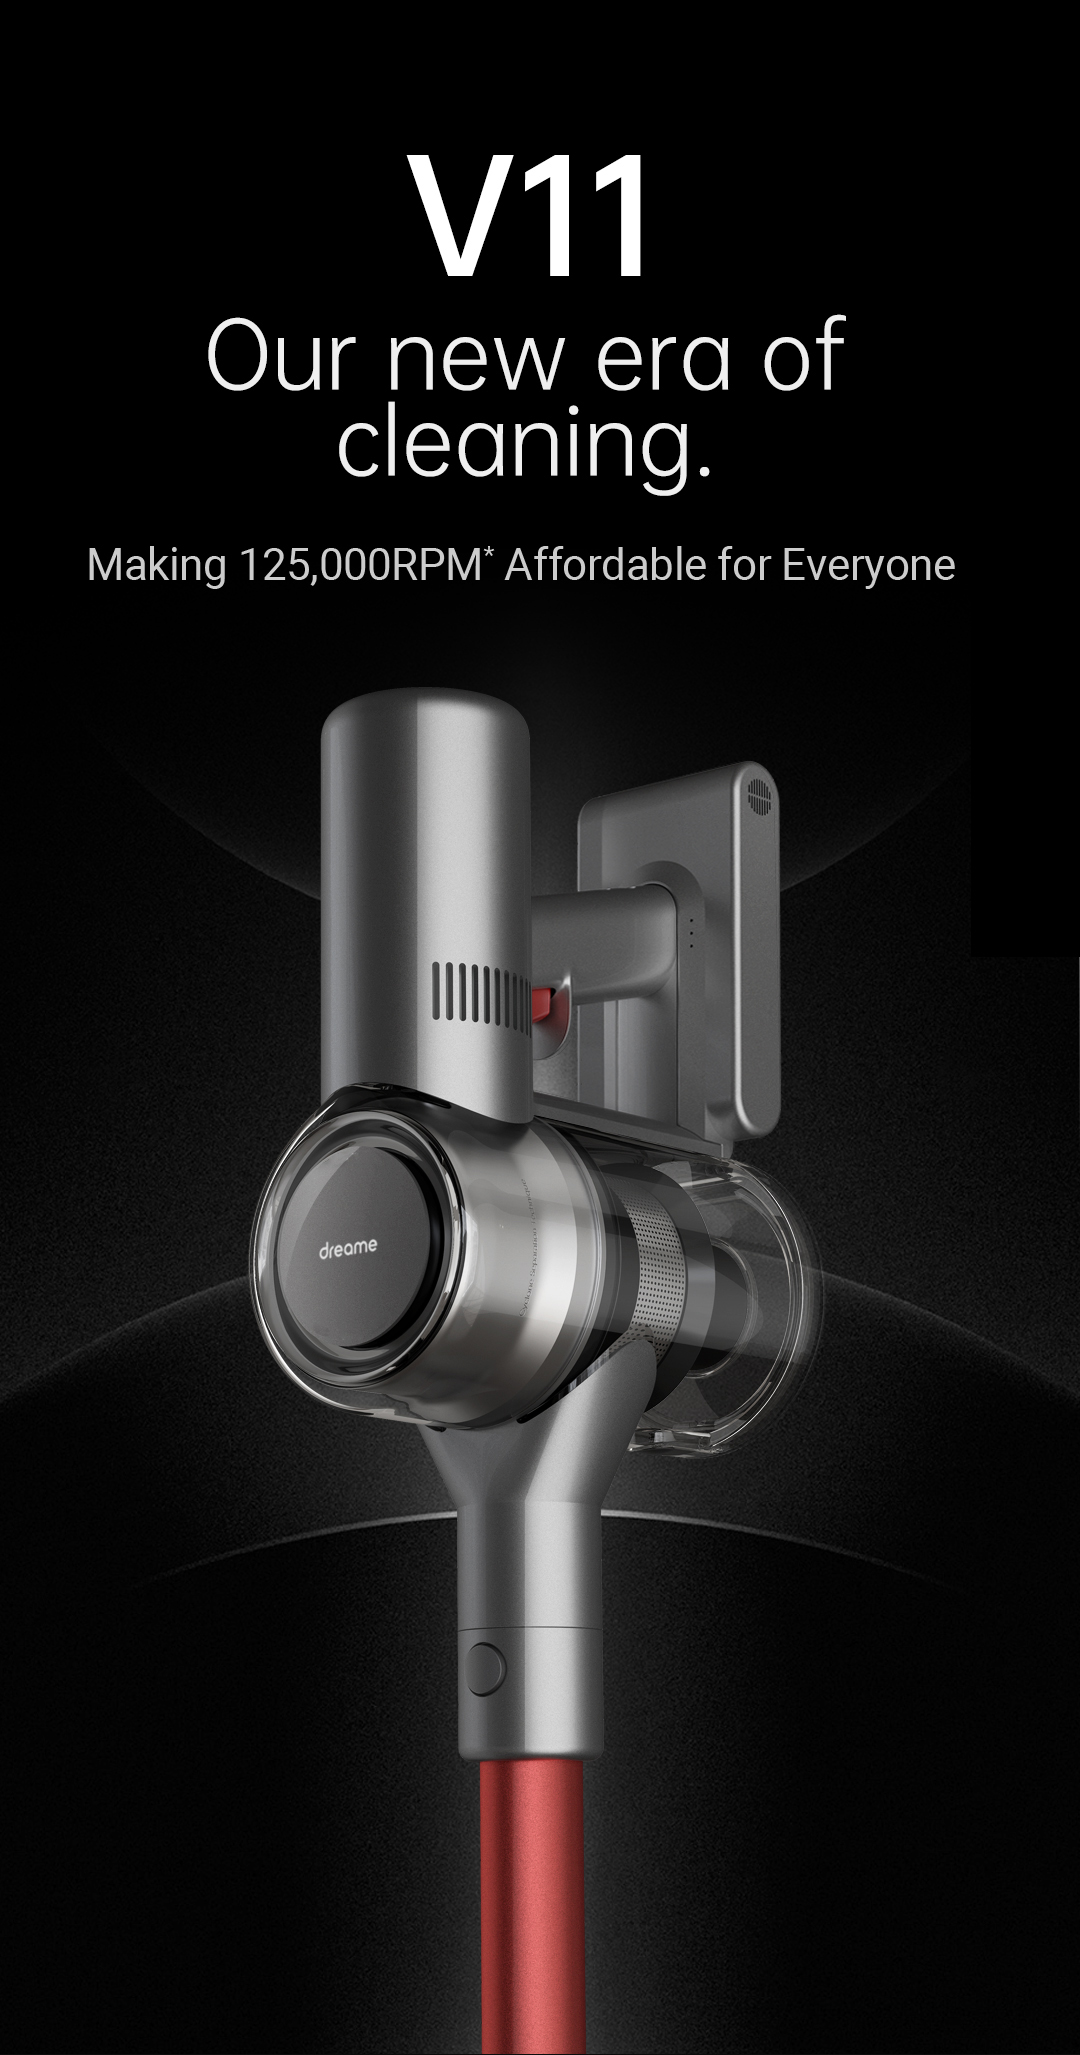 Dreame V11 Handheld Wireless Vacuum Cleaner